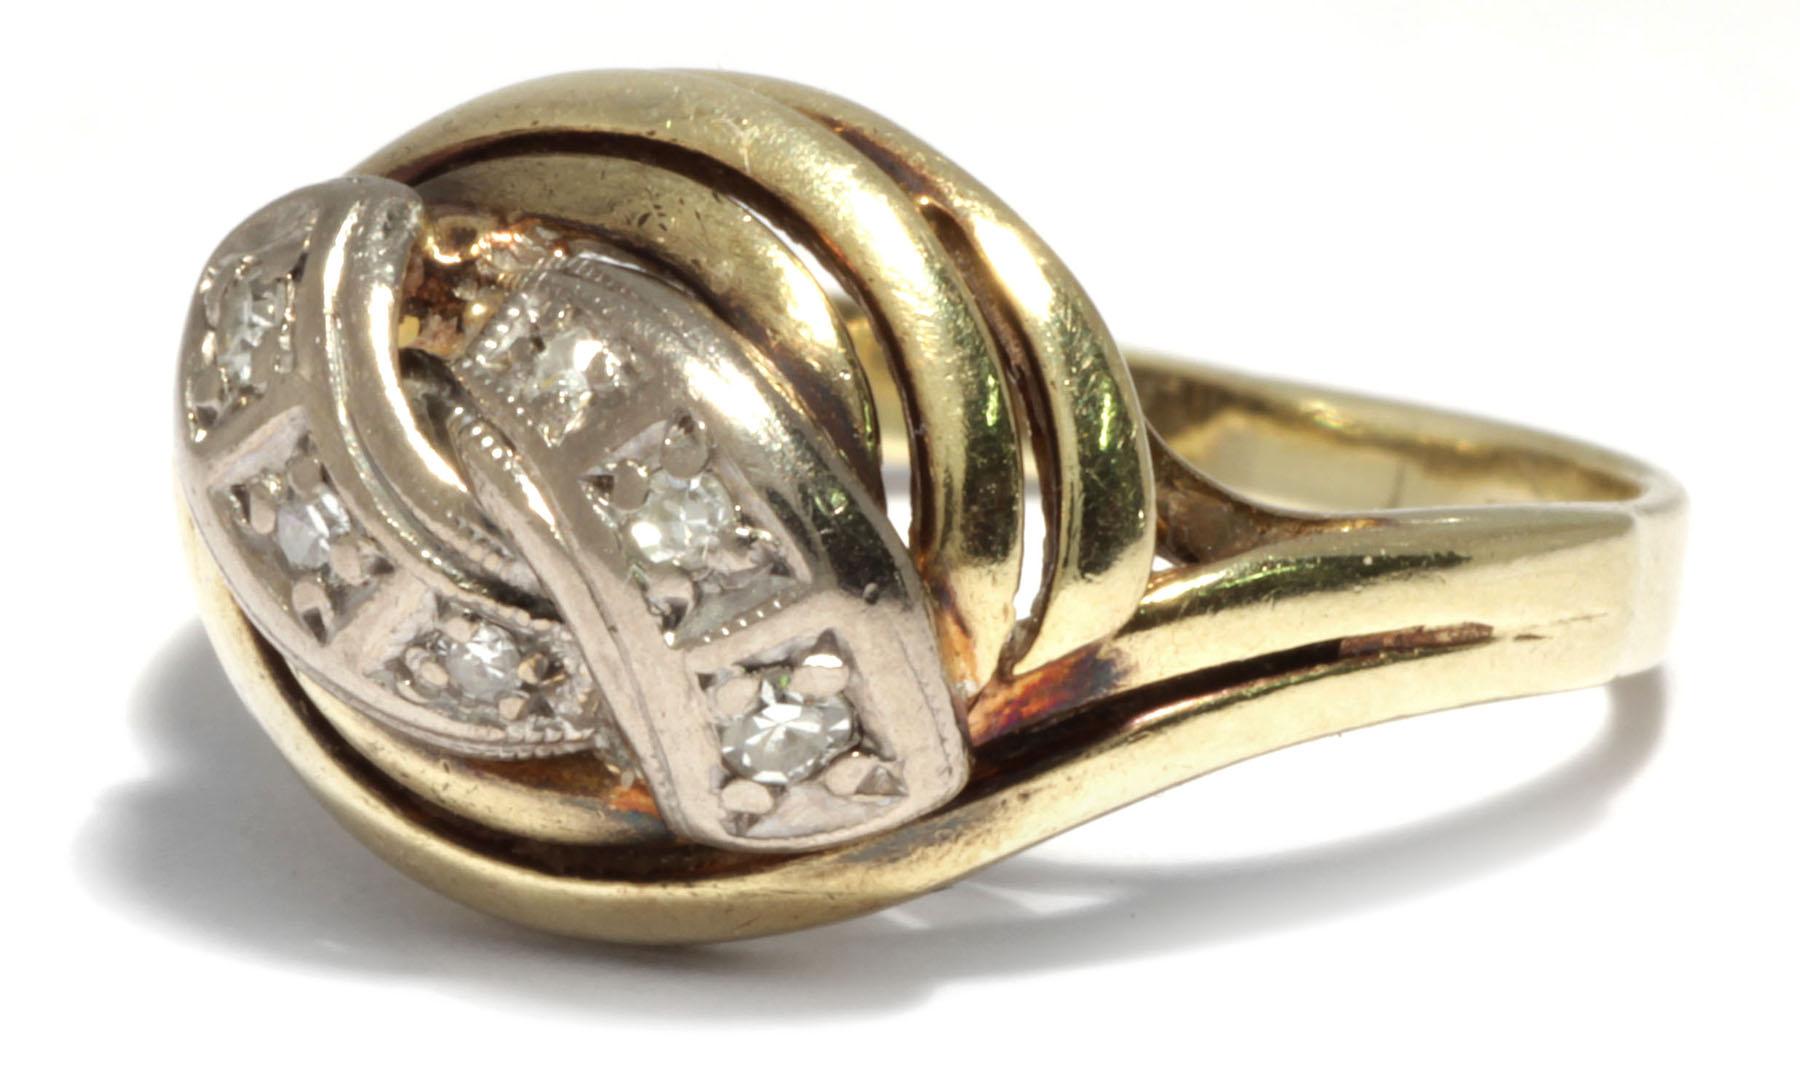 einzigartig diamantschmuck kaufen schmuck website. Black Bedroom Furniture Sets. Home Design Ideas